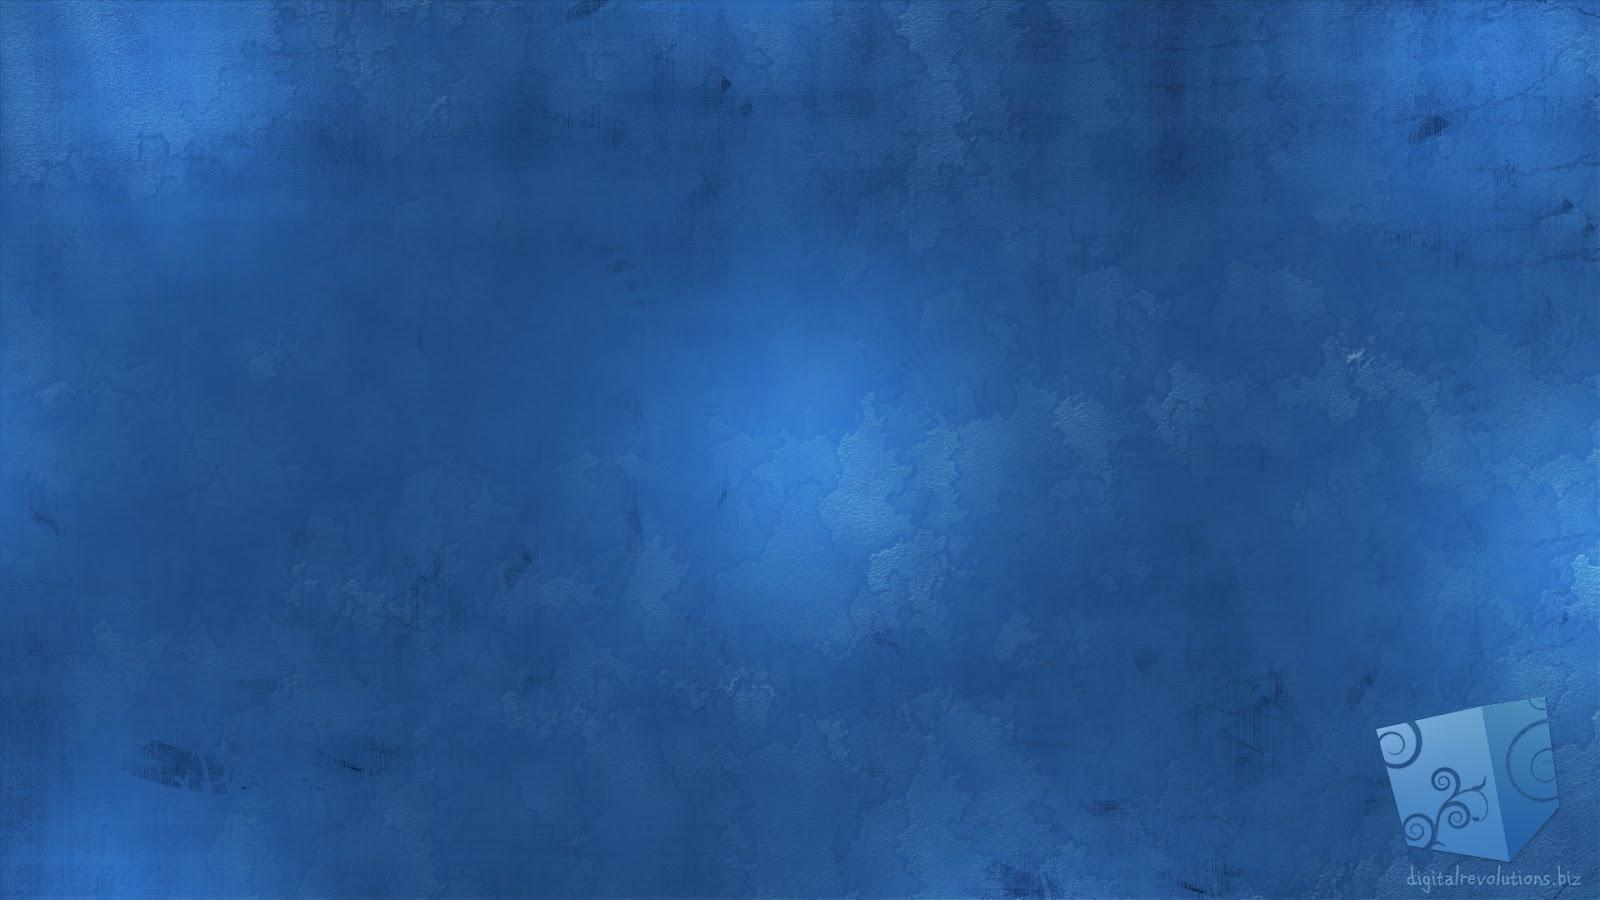 BLUE Art Background Wallpaper Image HD Zeromin0